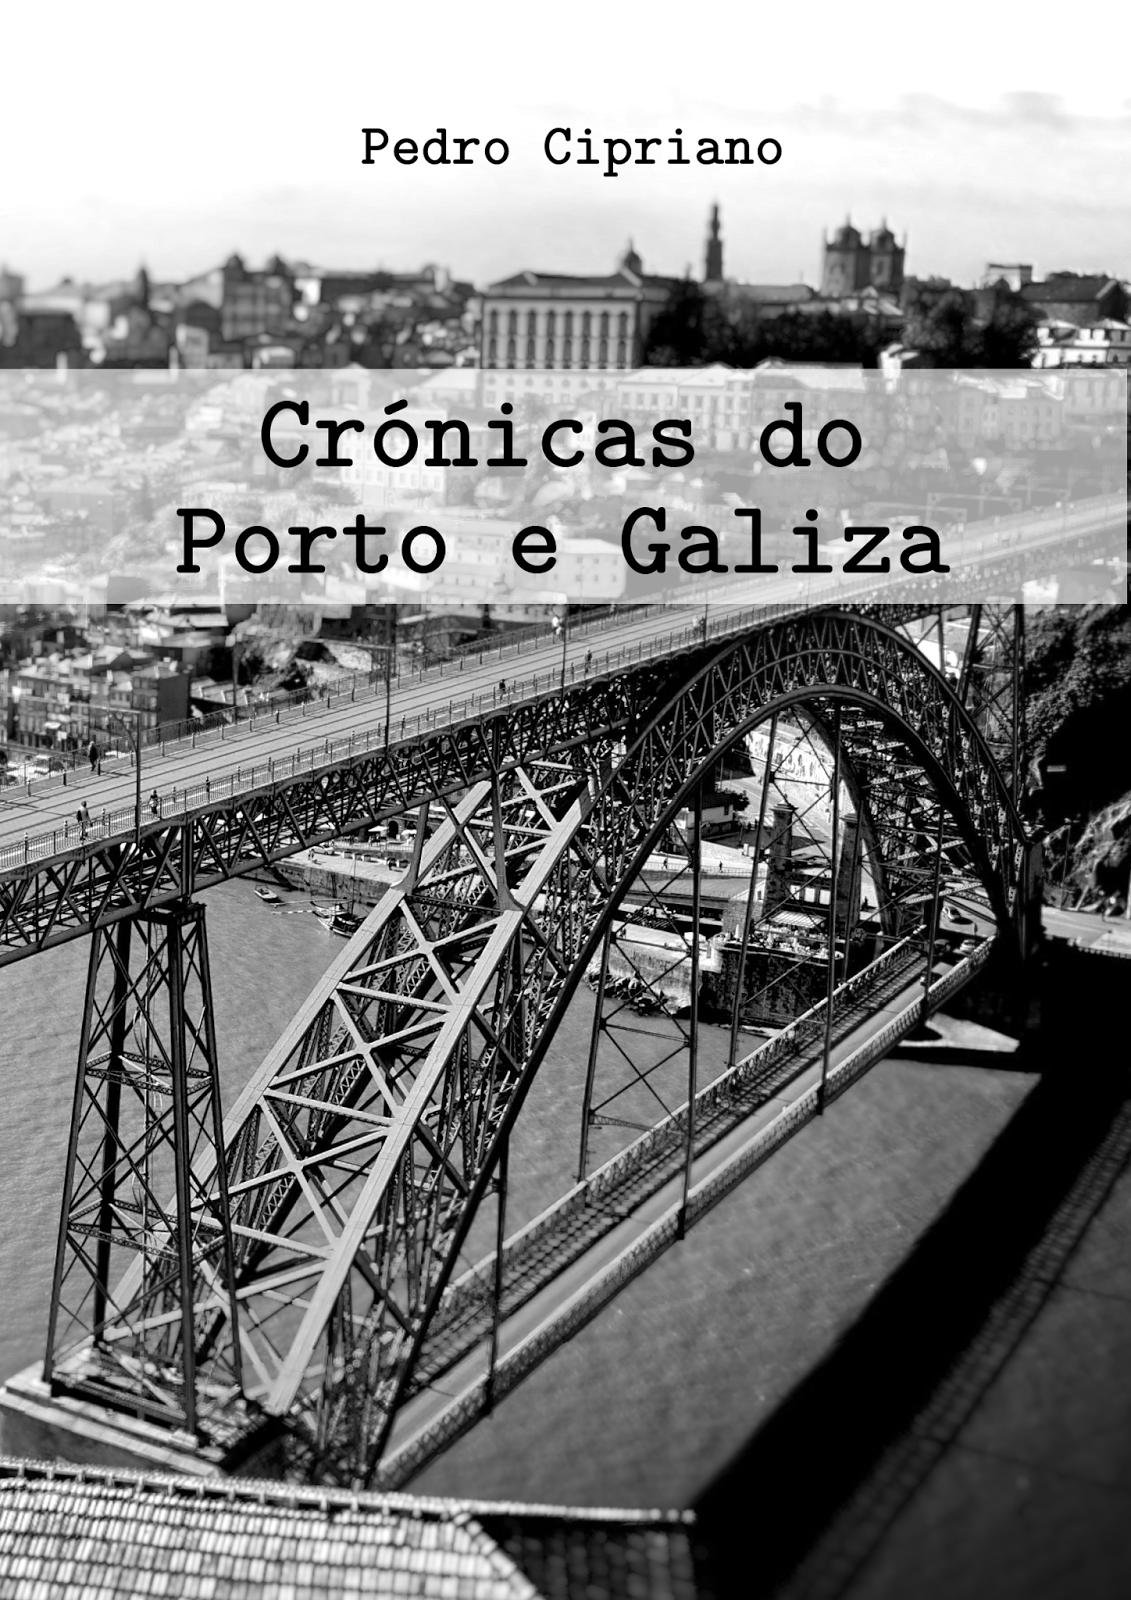 https://dl.dropboxusercontent.com/u/5059373/Cronicas.pdf